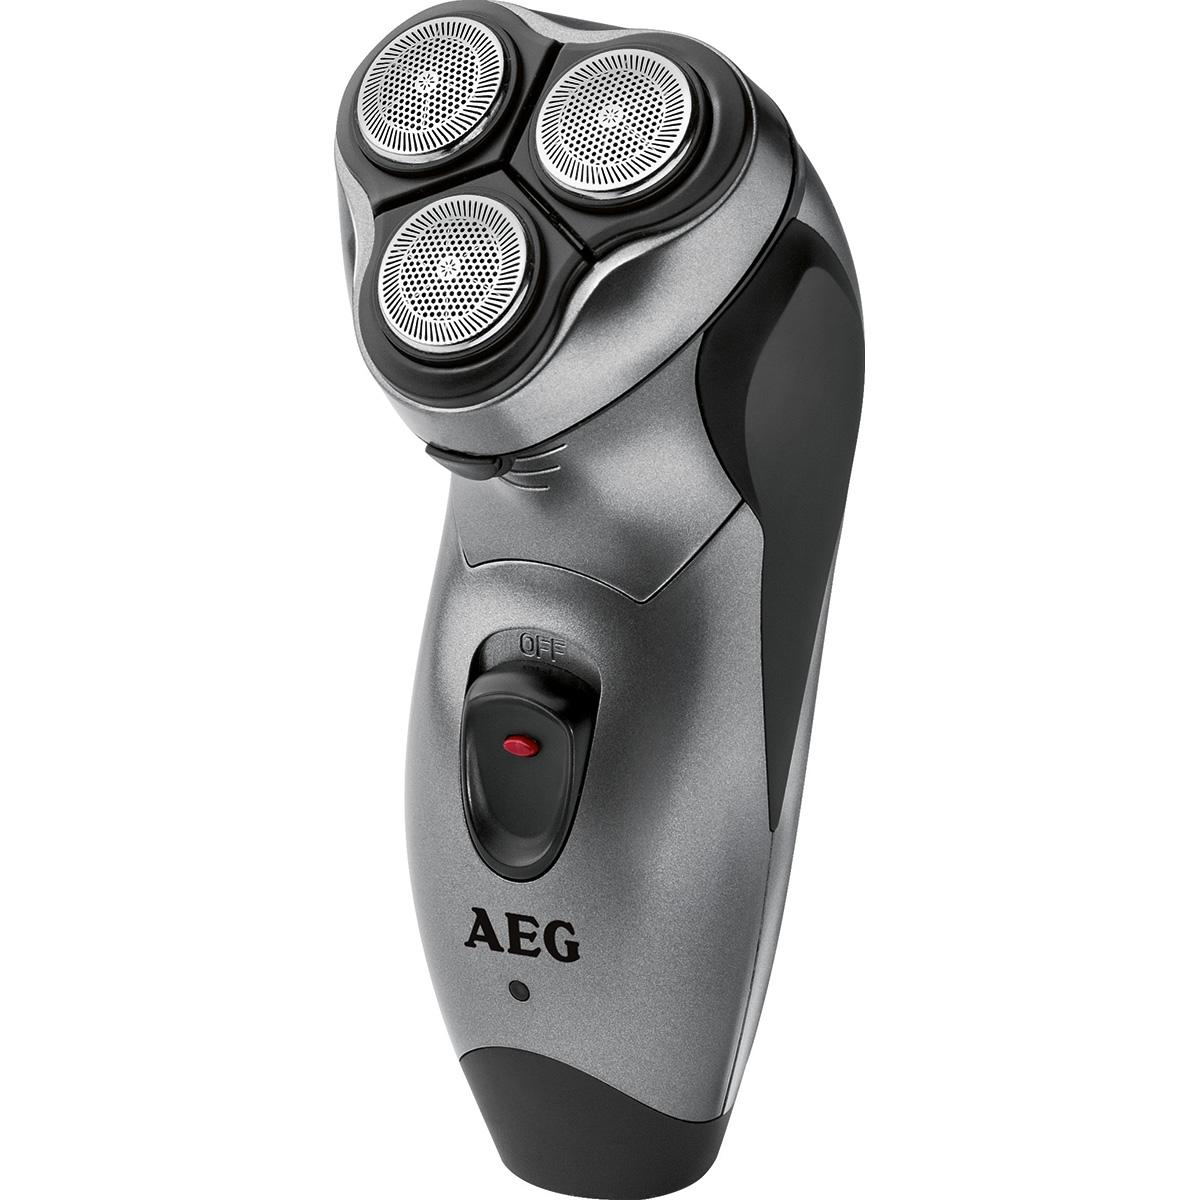 AEG HR 5654 - Afeitadora eléctrica rotativa para hombre, recorta ...